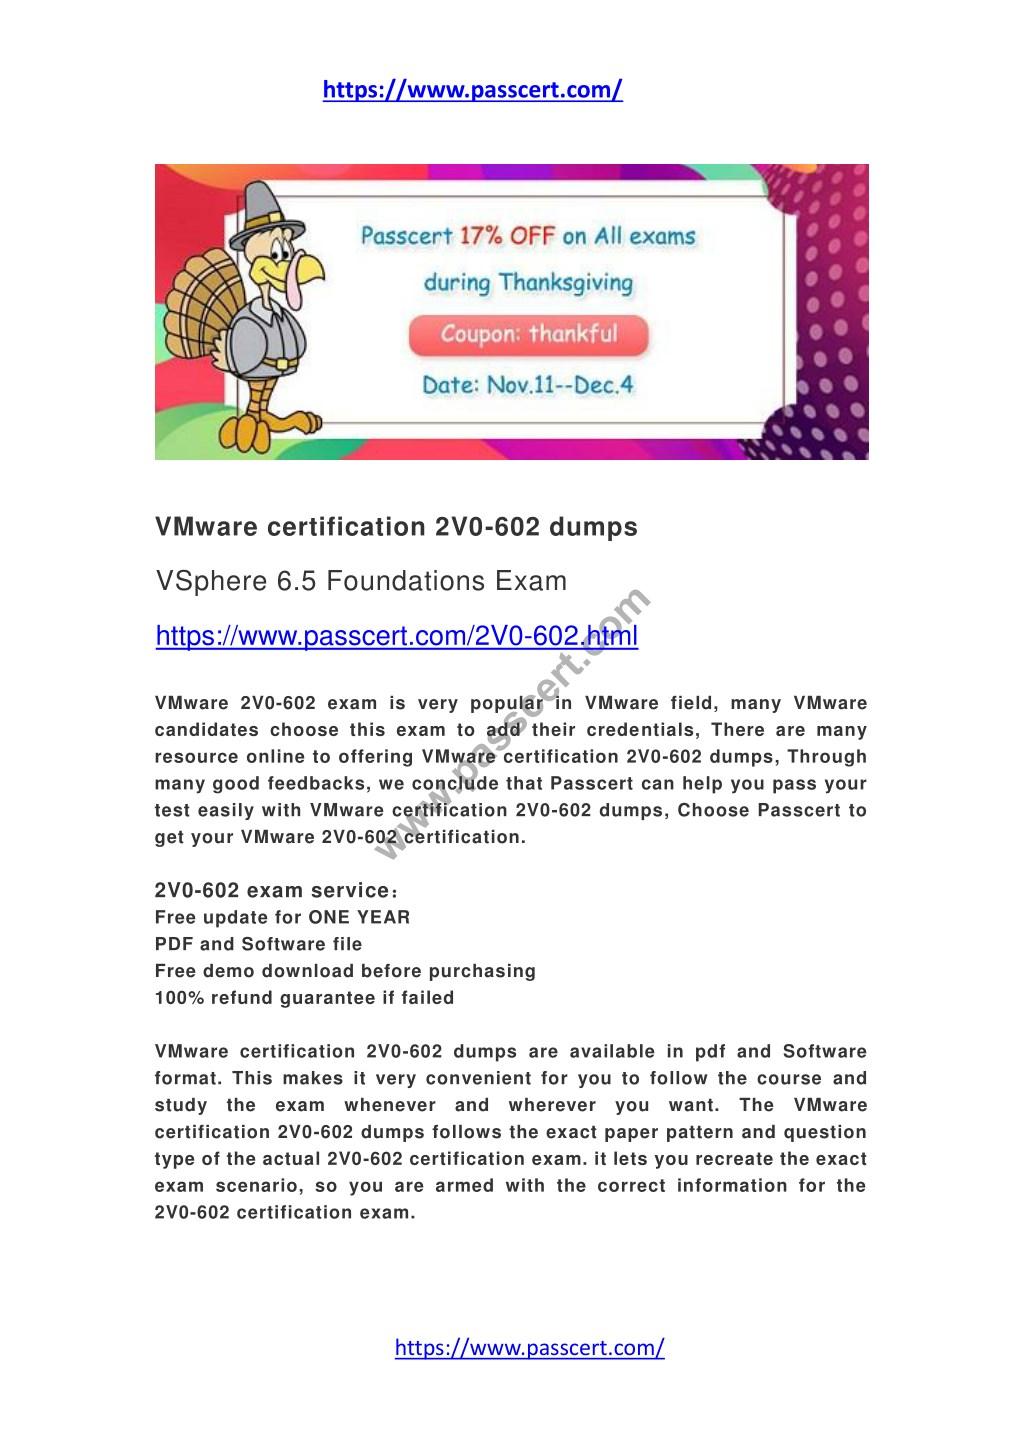 Ppt Vmware Certification 2v0 602 Dumps Powerpoint Presentation